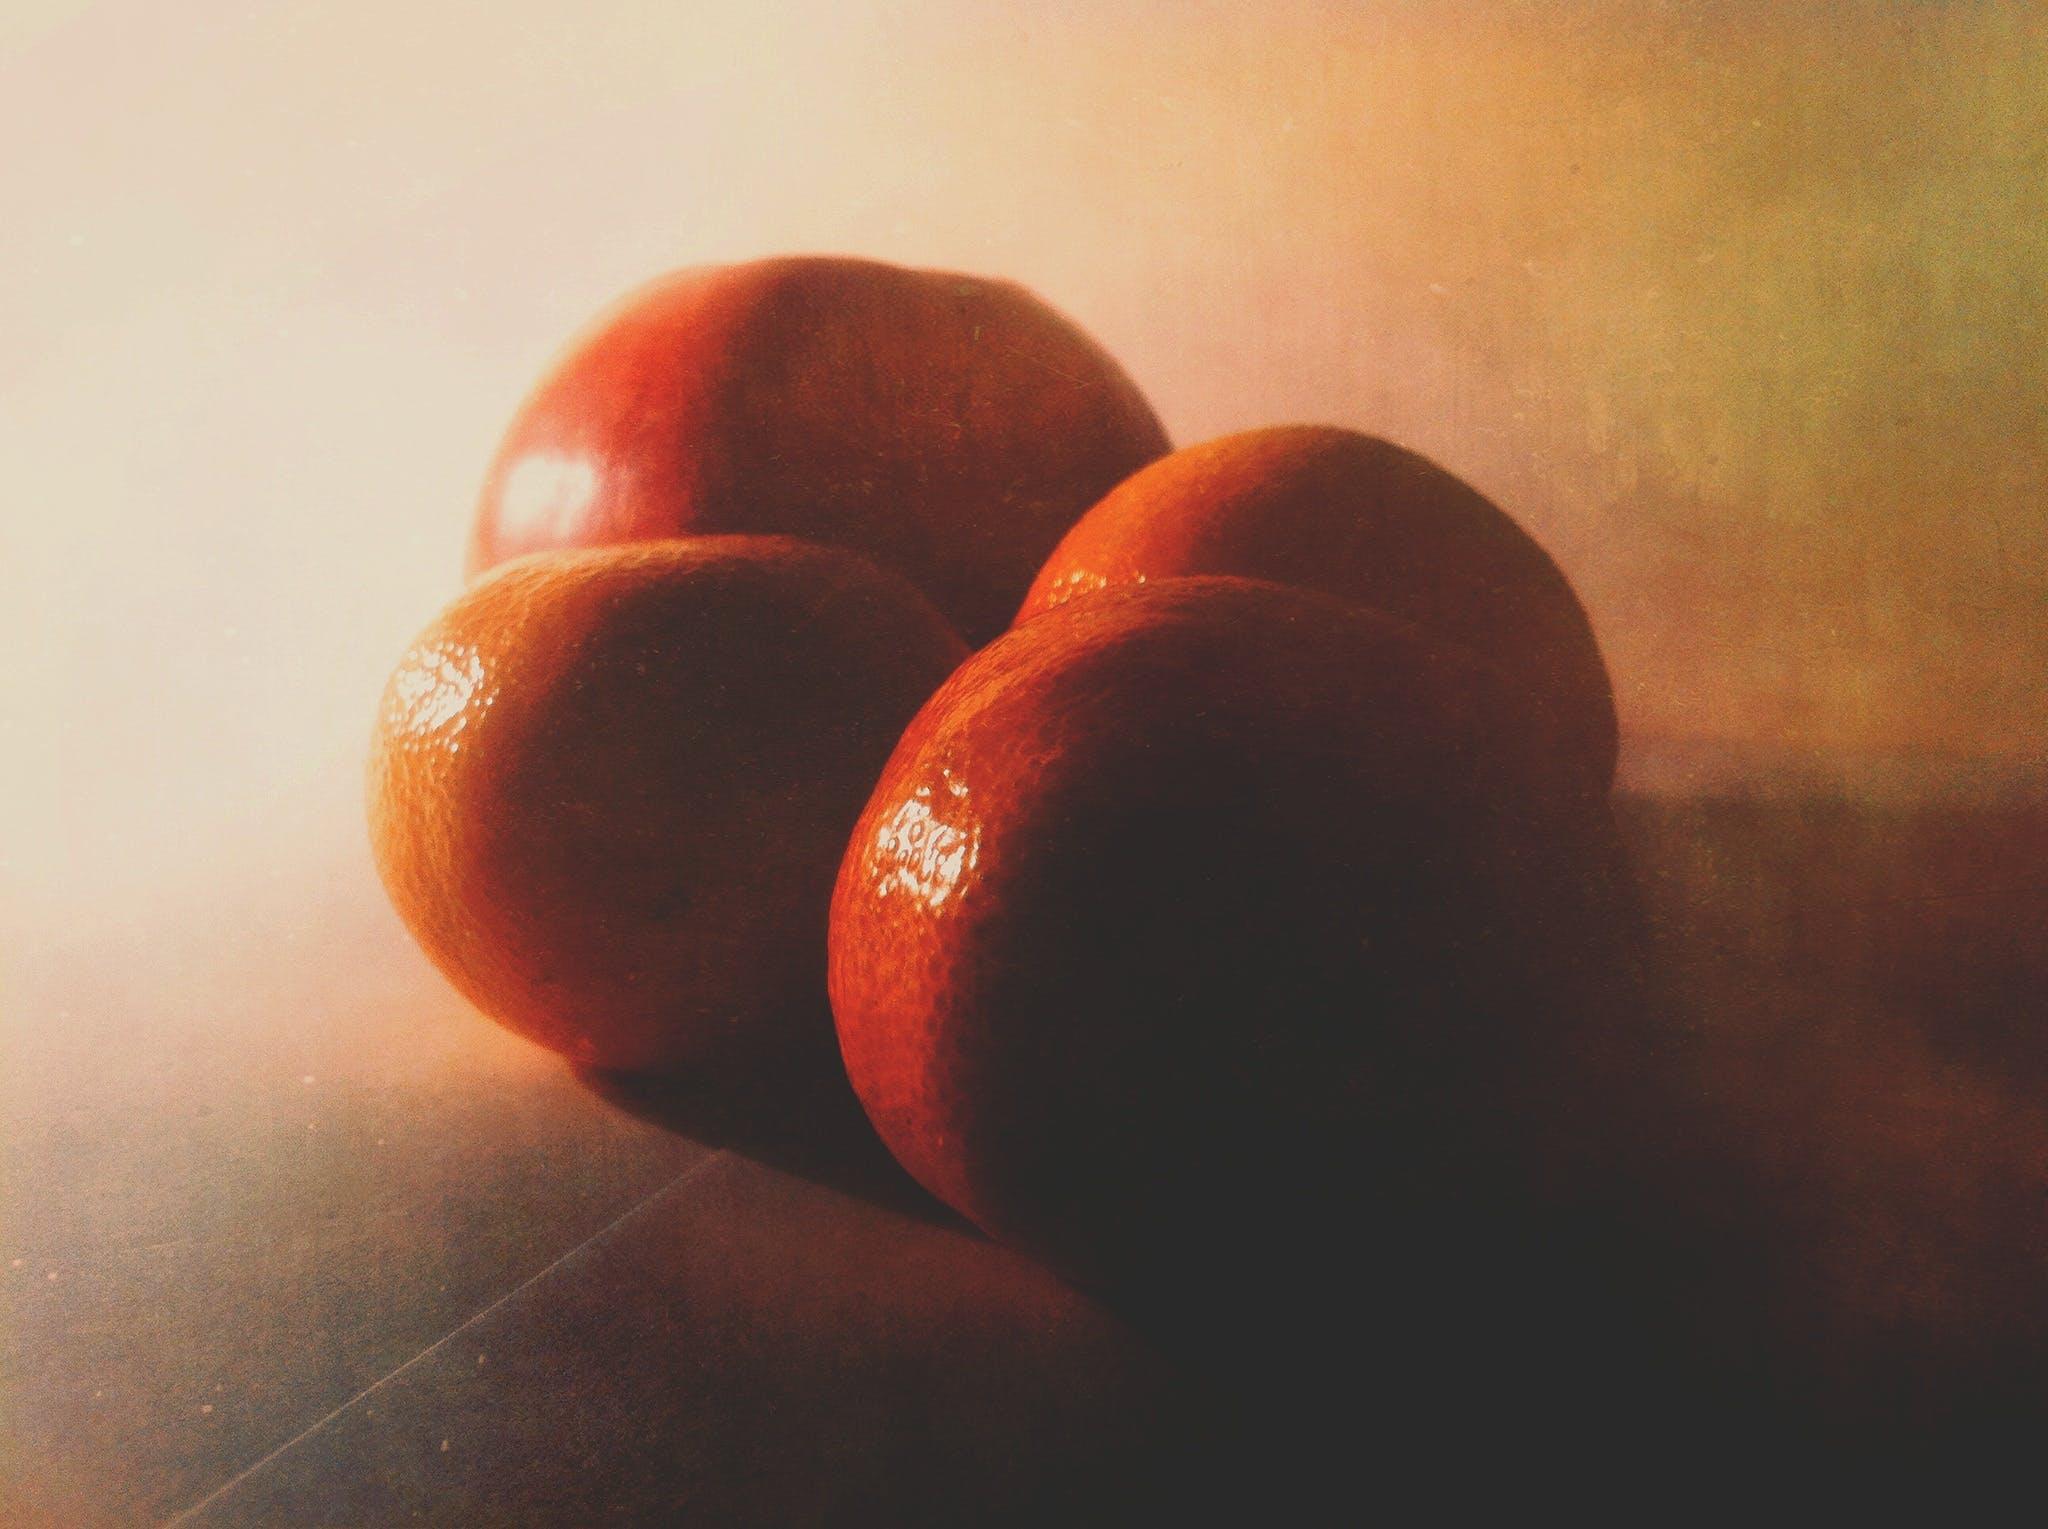 Free stock photo of light, apple, winter, home